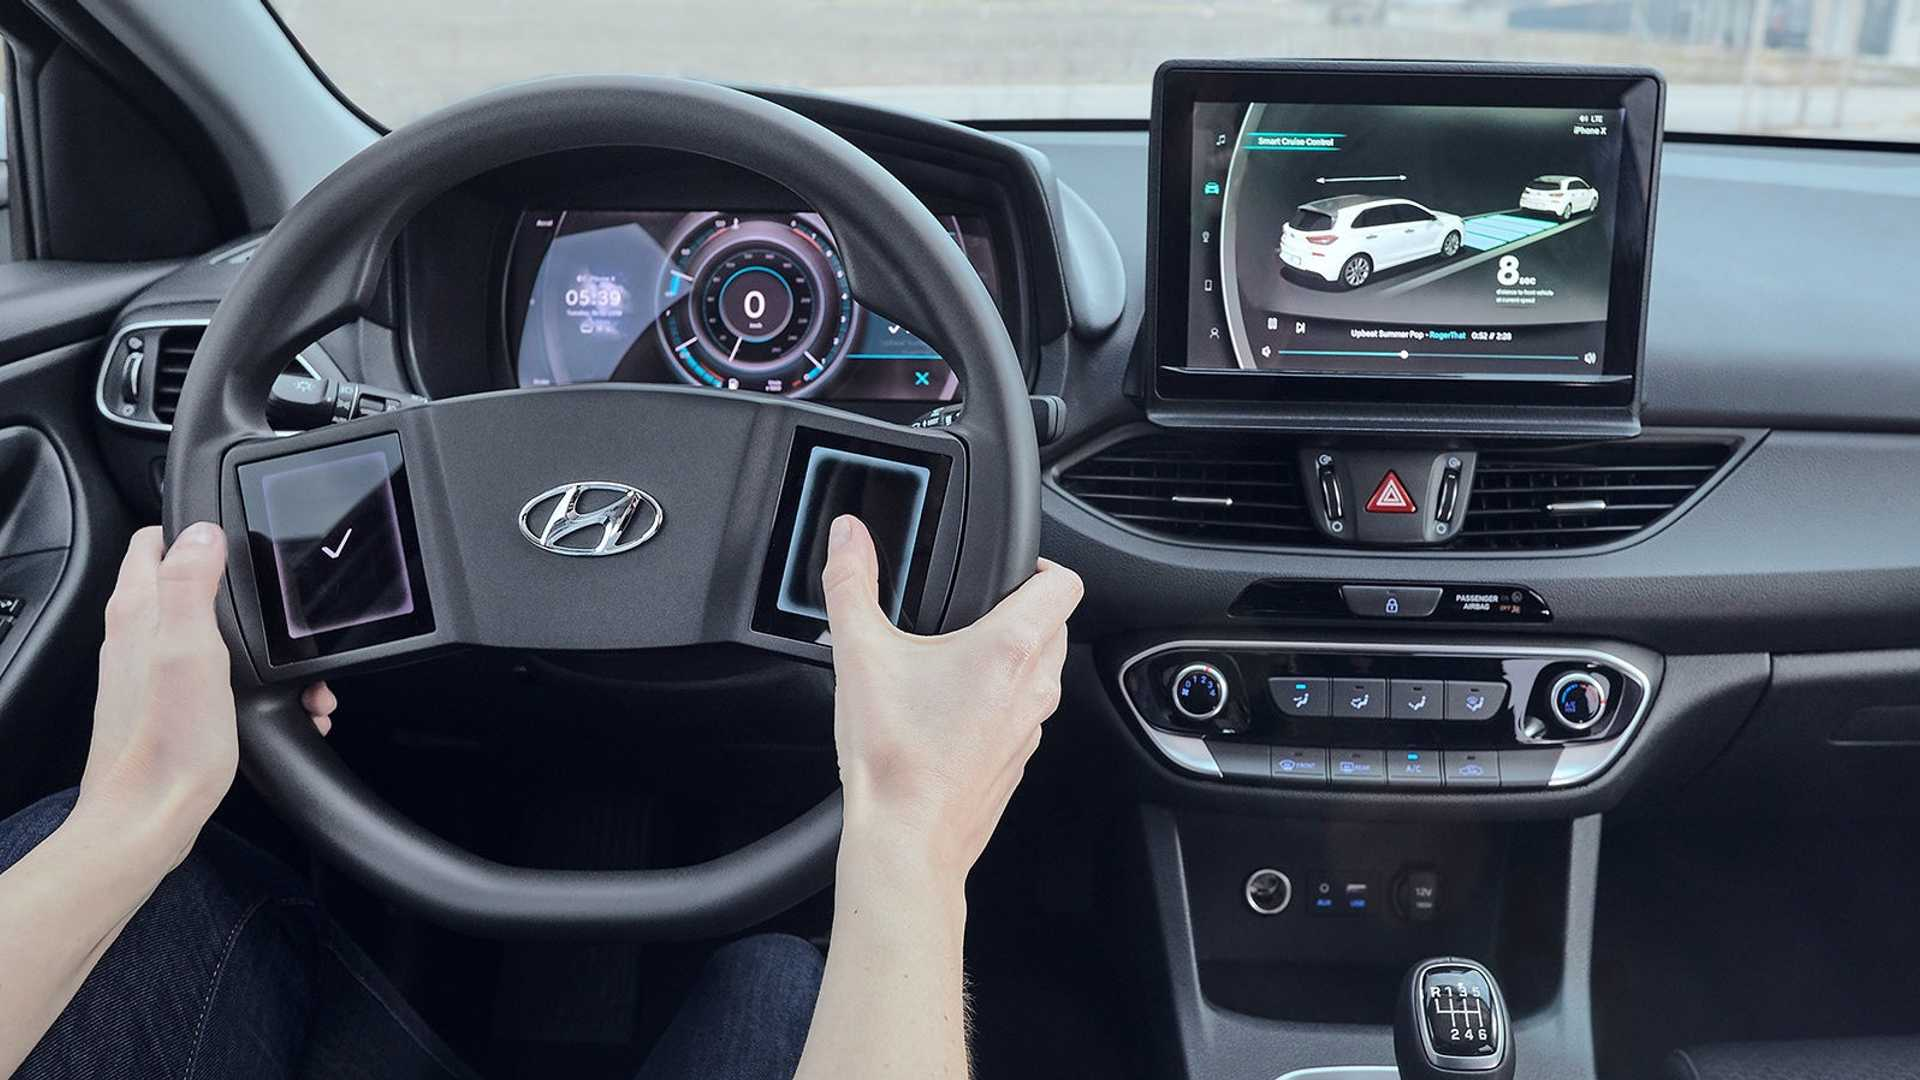 Hyundai Thinks Steering Wheel Touchscreens Are A Good Idea